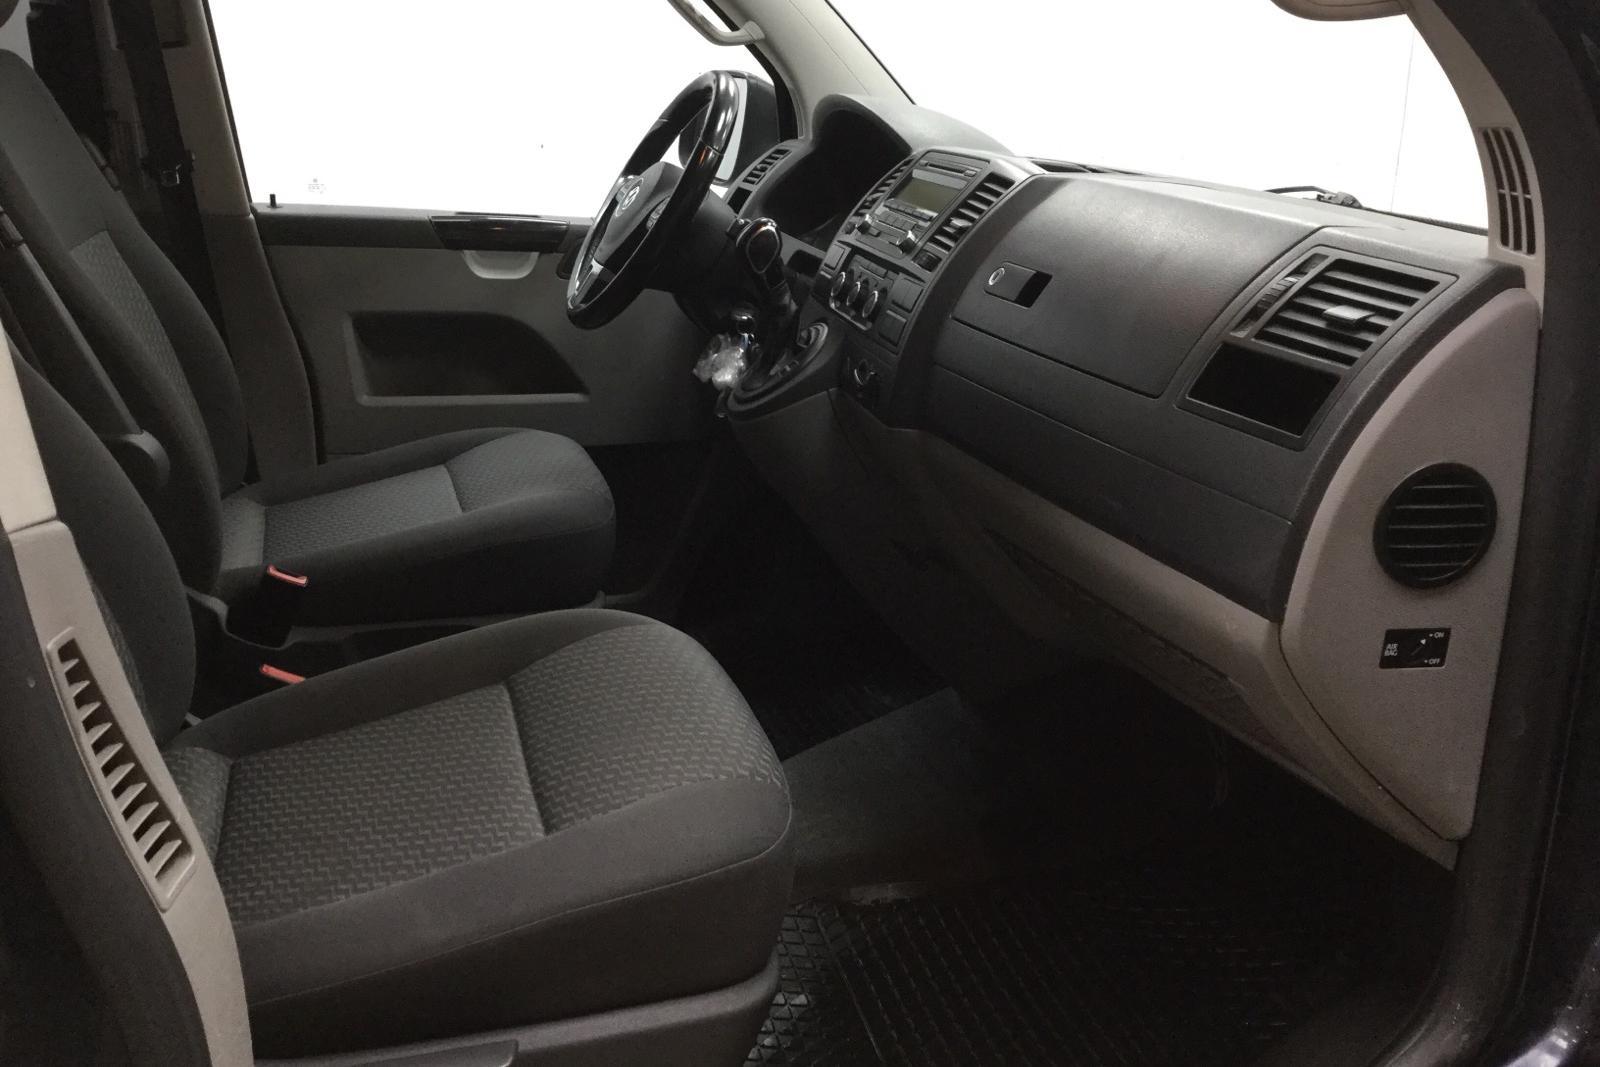 VW Transporter T5 2.0 TDI 4MOTION (180hk) - 23 000 mil - Automat - Dark Blue - 2011